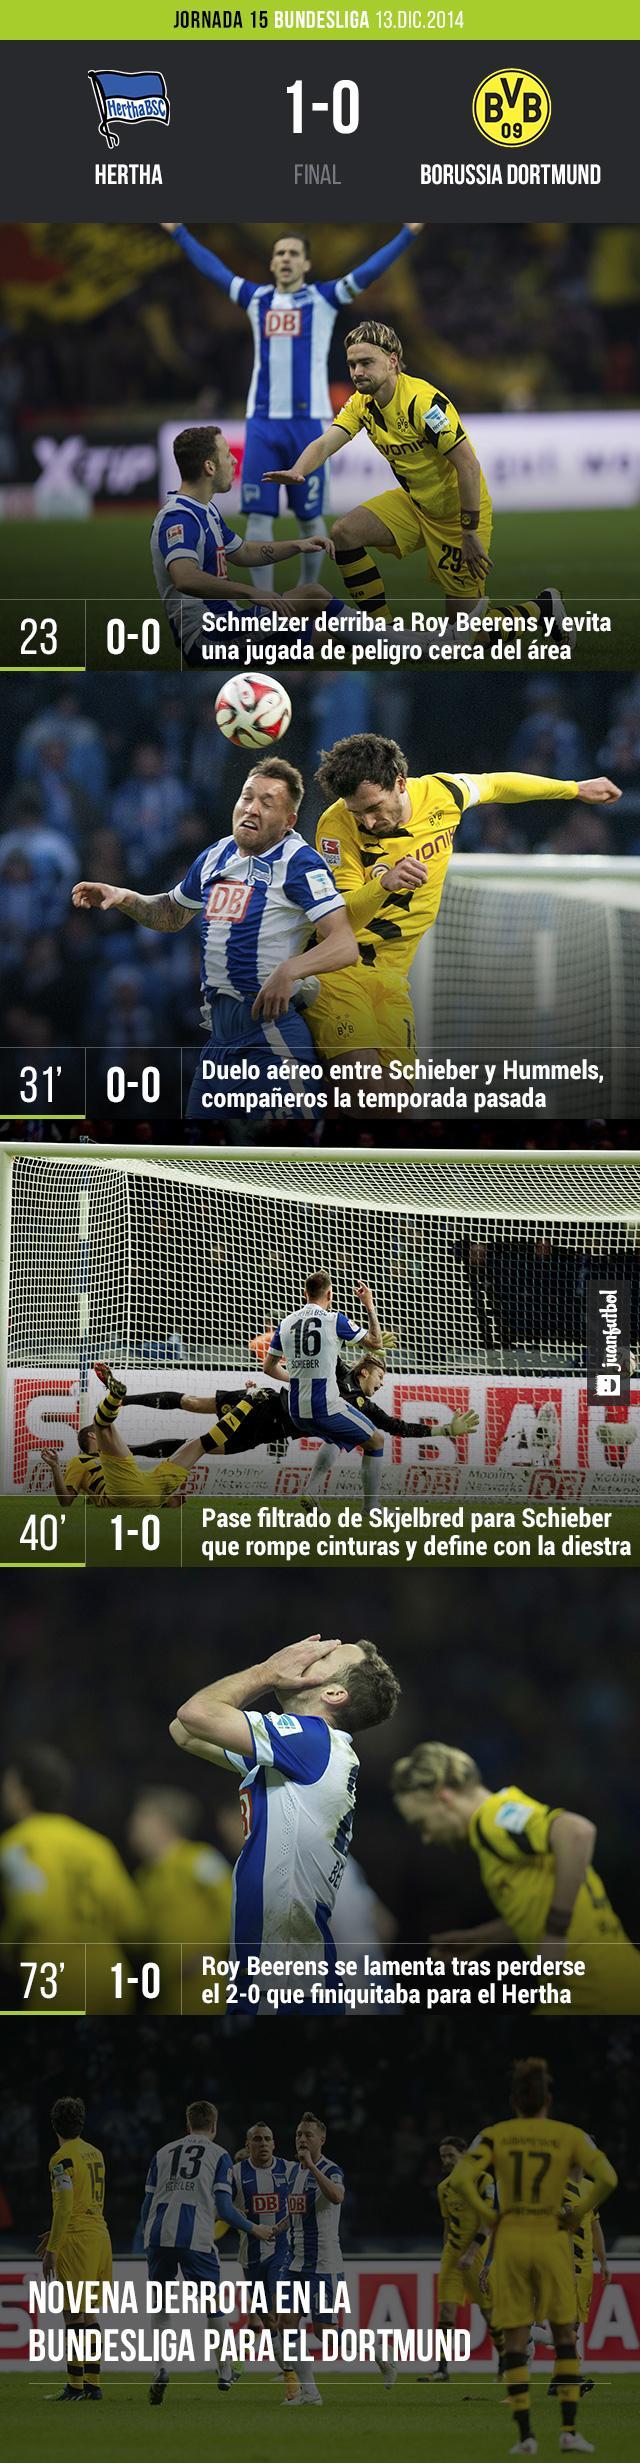 El Hertha Berlin le pegó 1-0 al Borussia Dortmund con gol de Julian Schieber